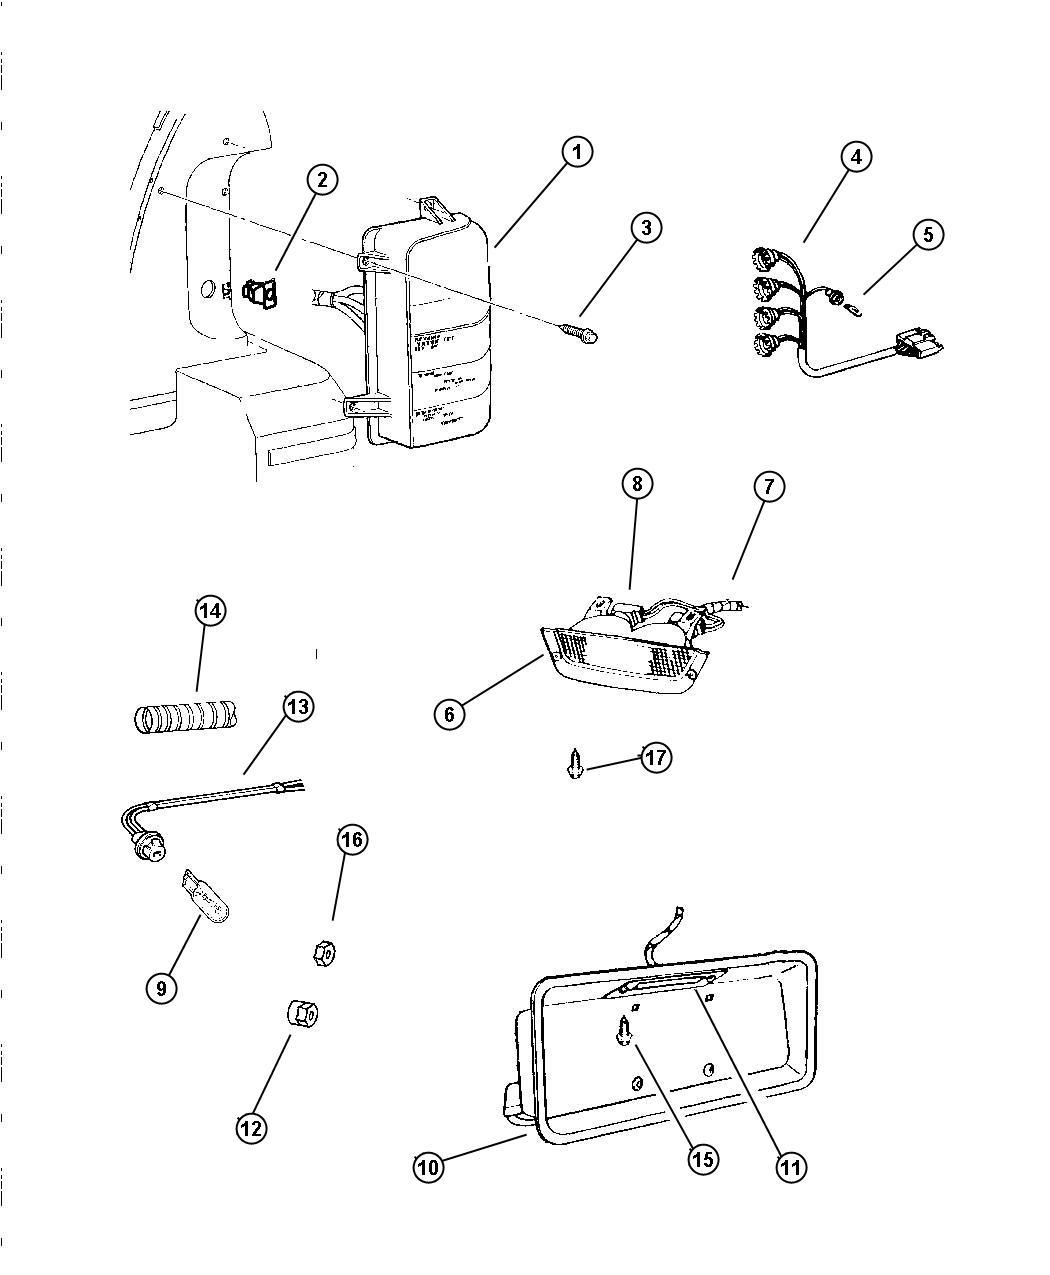 [DIAGRAM] 01 Jeep Grand Cherokee Rear Lamp Wiring Diagram